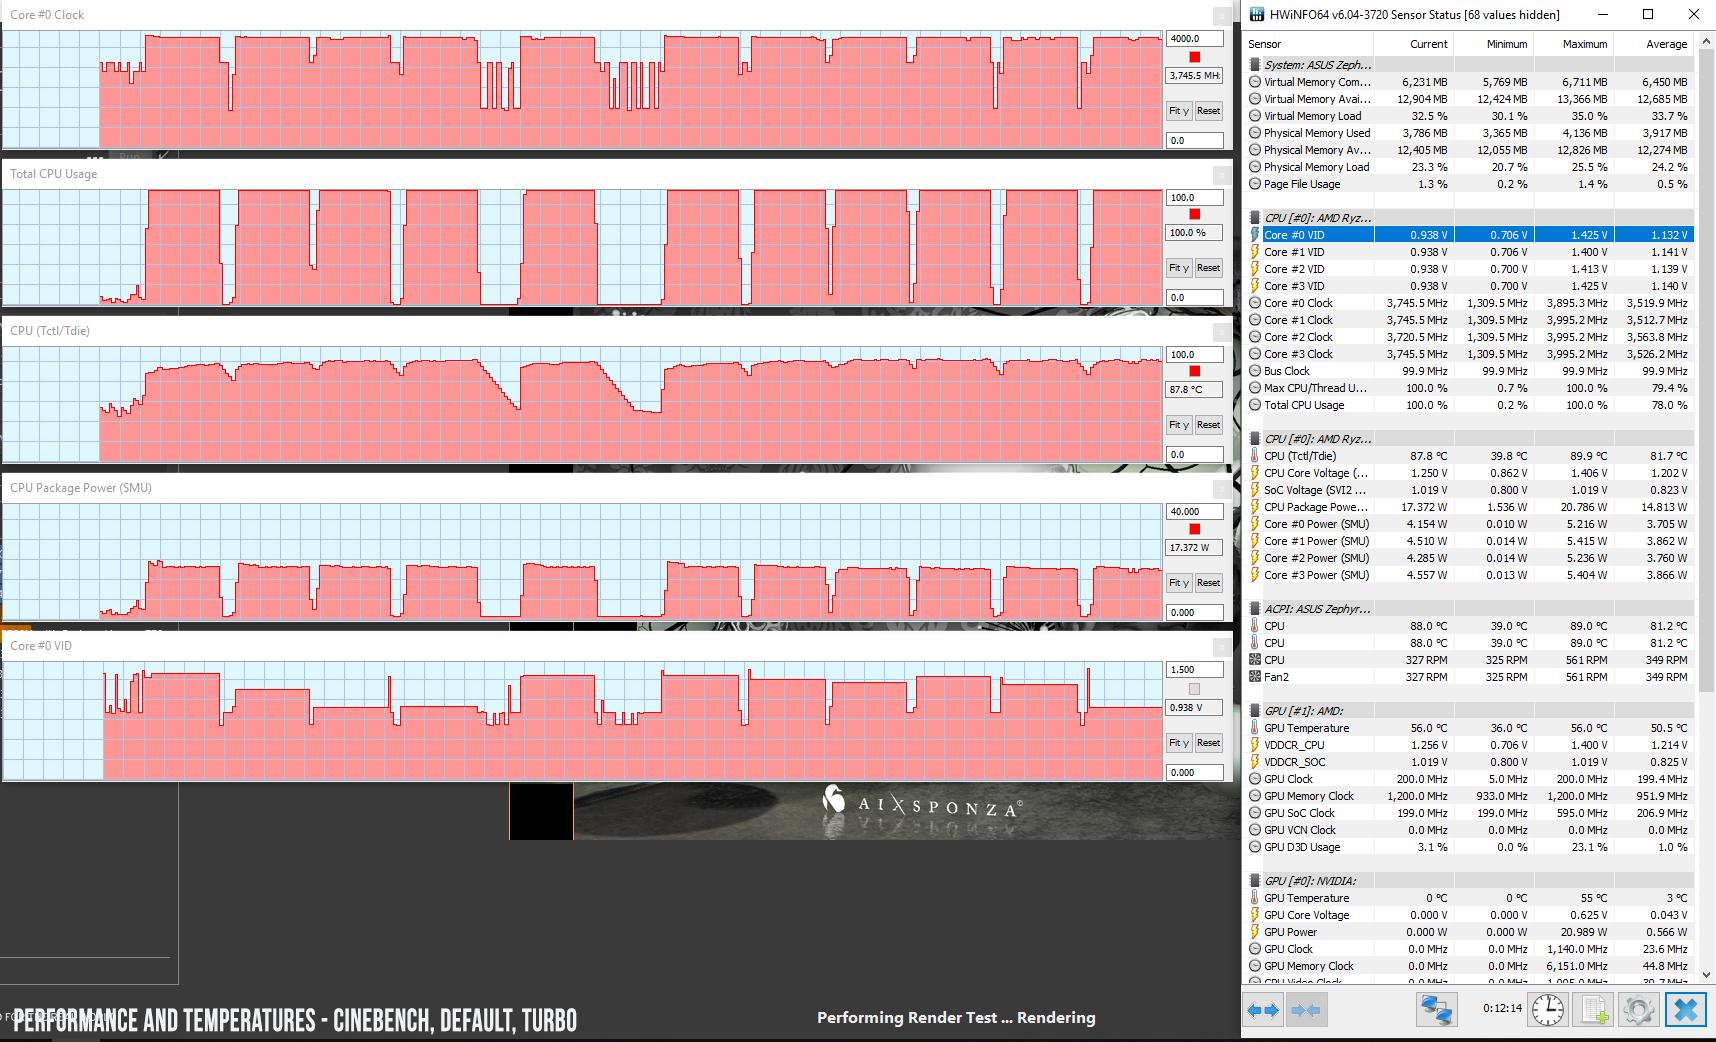 Asus ROG Zephyrus G GA502DU review (AMD R7 3750H, Nvidia GTX